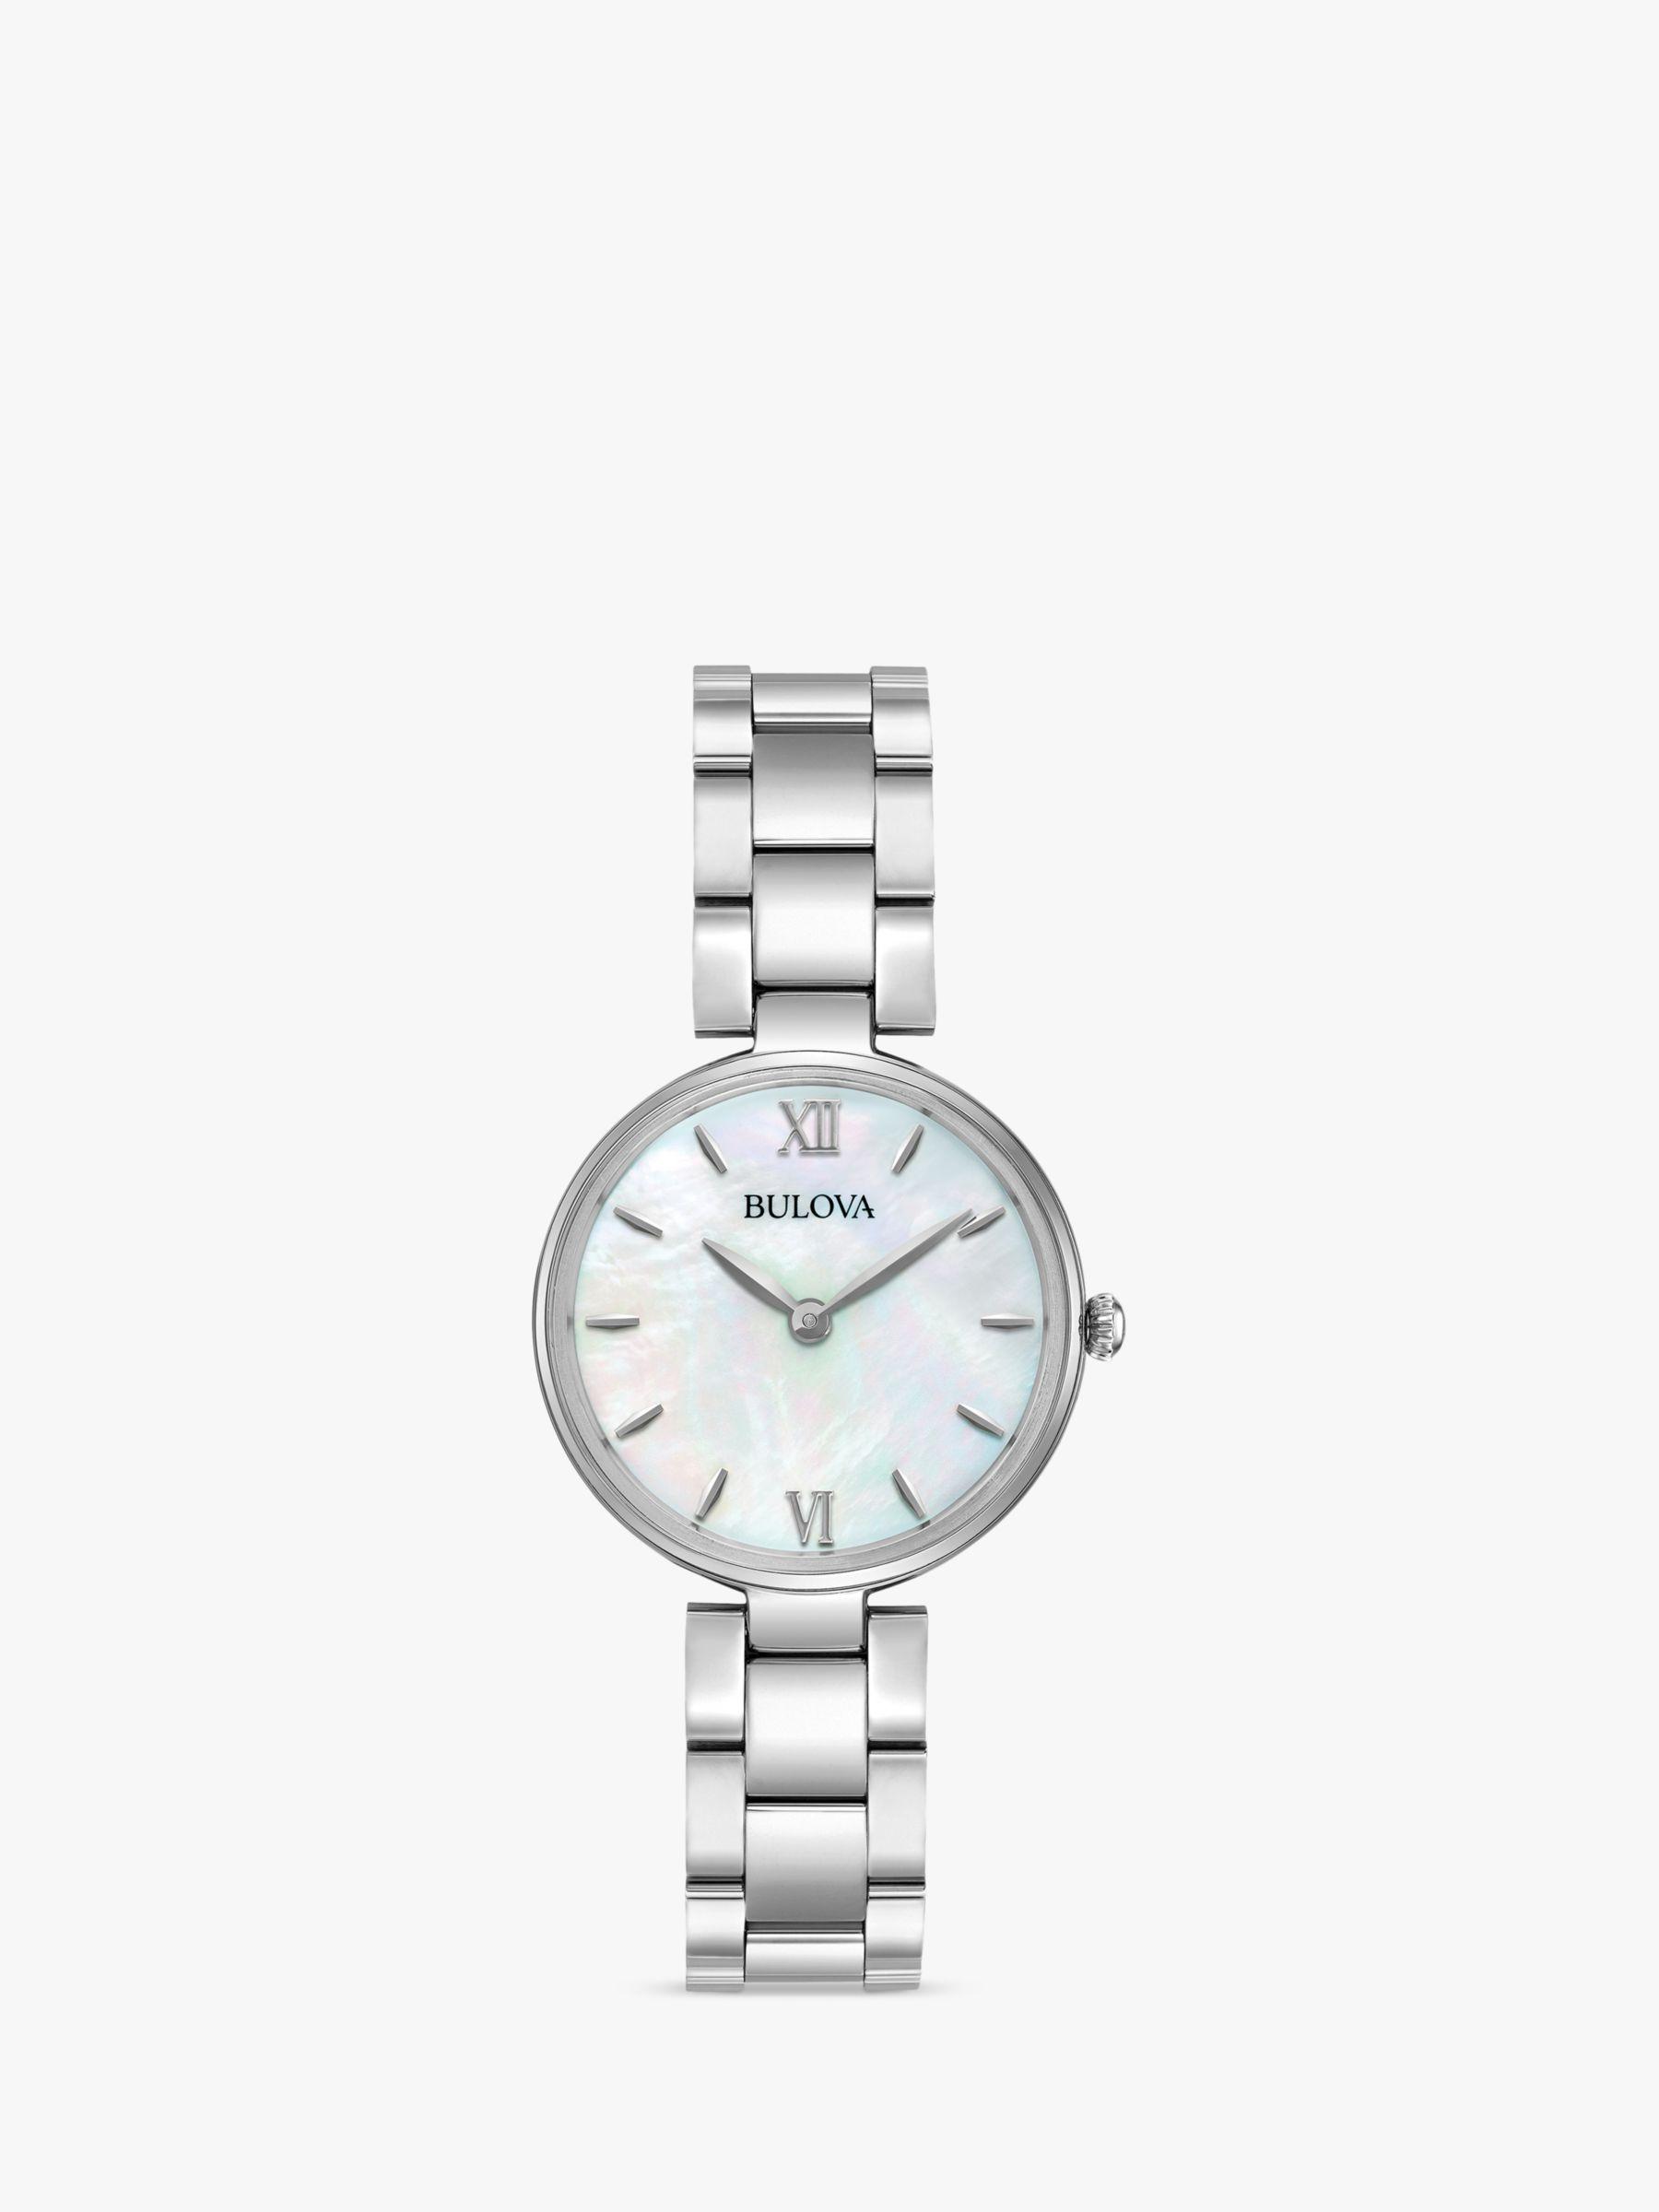 Bulova Bulova 96L229 Women's Classic Bracelet Strap Watch, Silver/Mother of Pearl